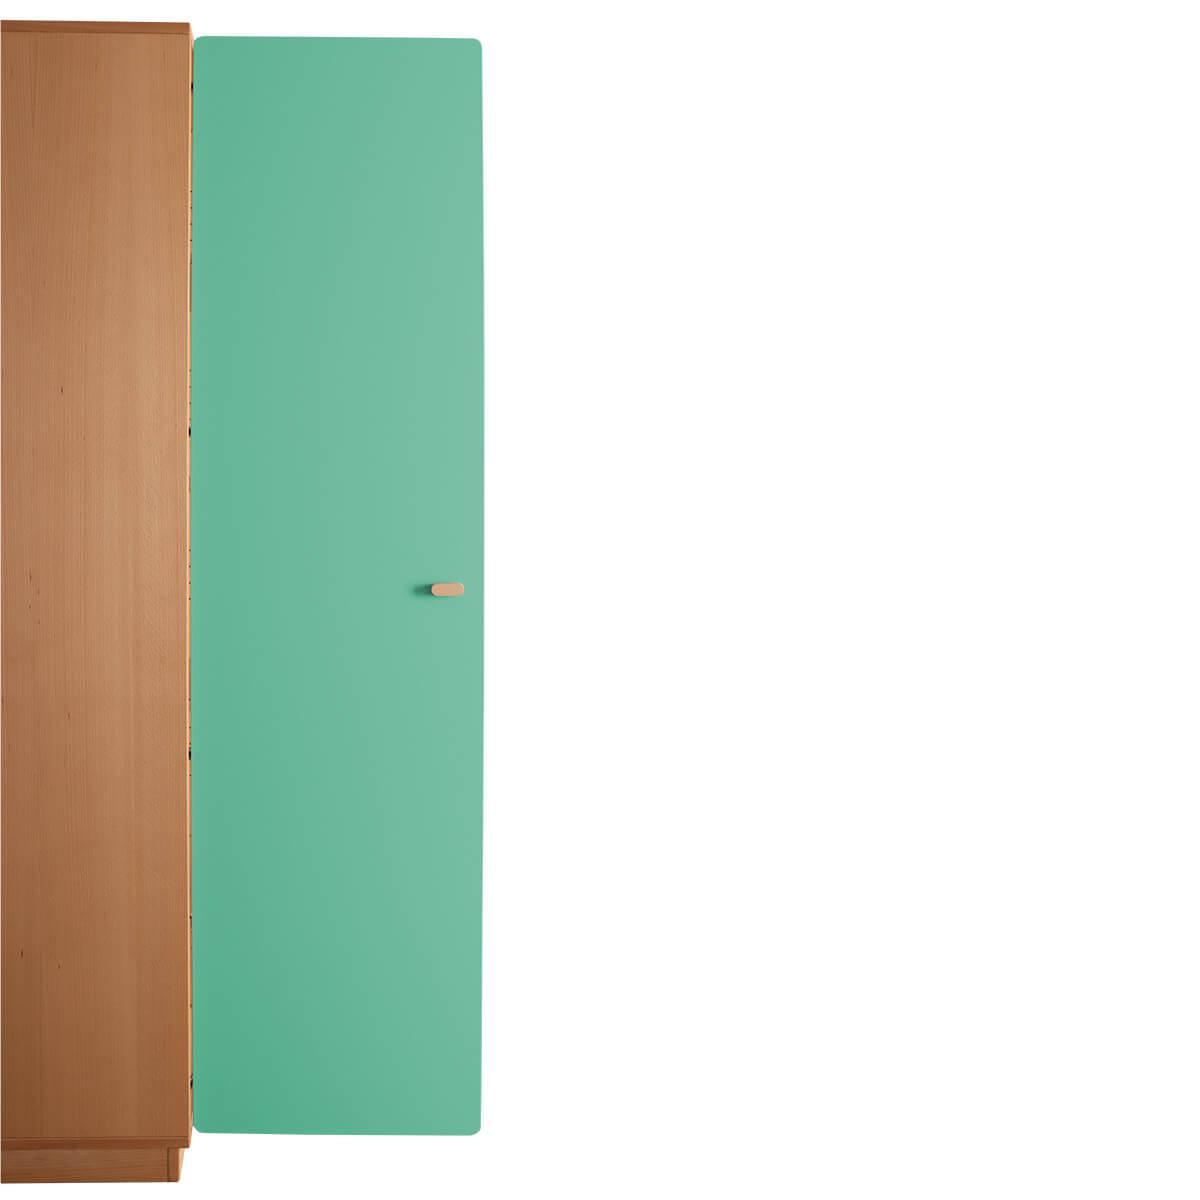 Schranktür 5/5 176cm-Griff DESTYLE de Breuyn MDF grün-lackiert